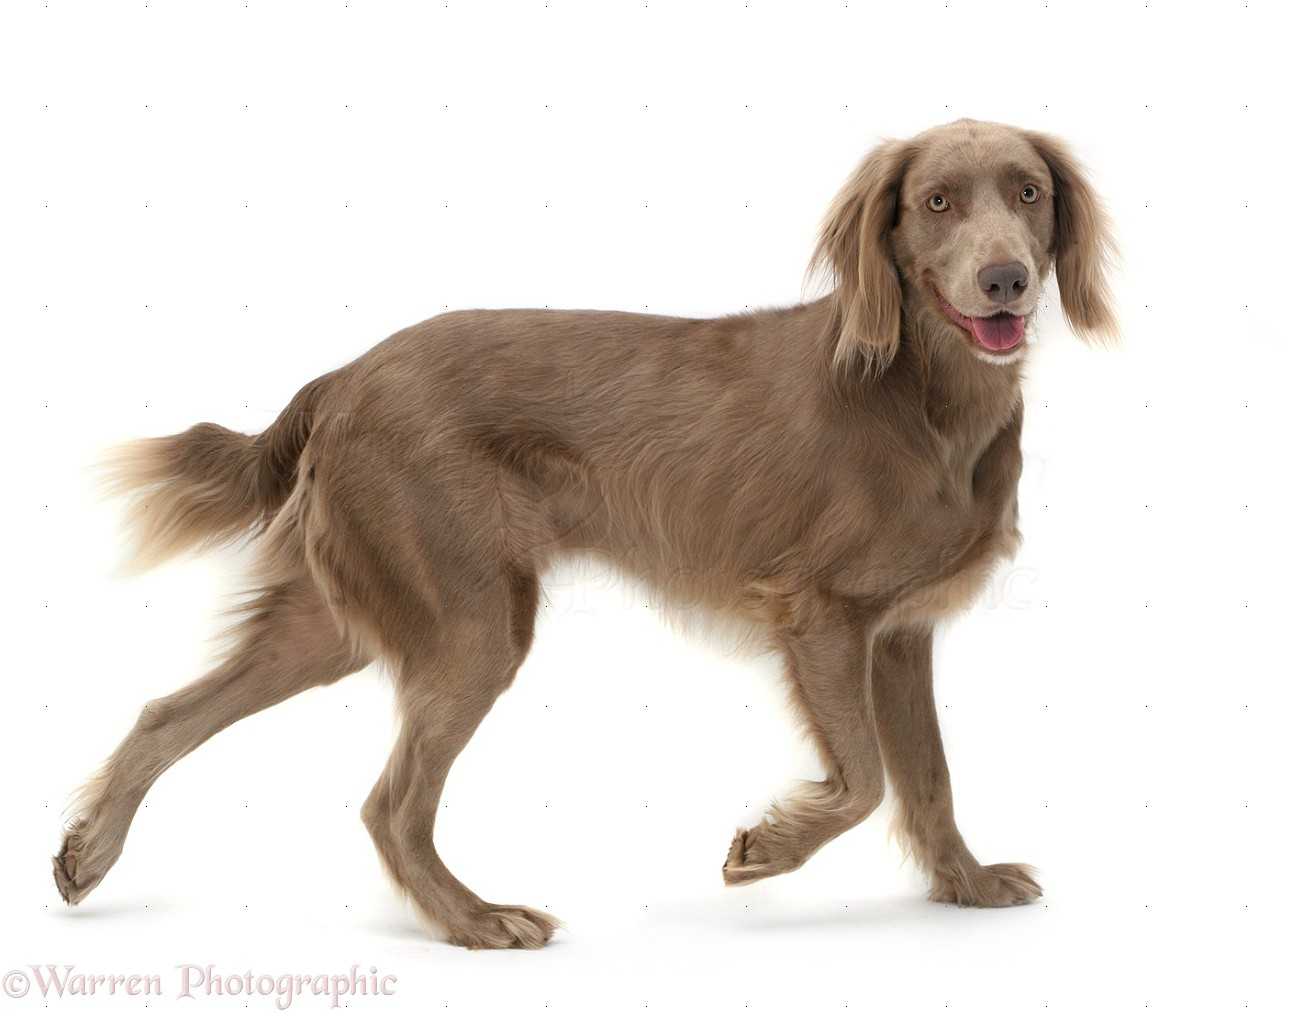 Image of: Fun Wp13438 Weimaraner Dog Max Parade Weimaraner Dog Walking Across Photo Wp13438